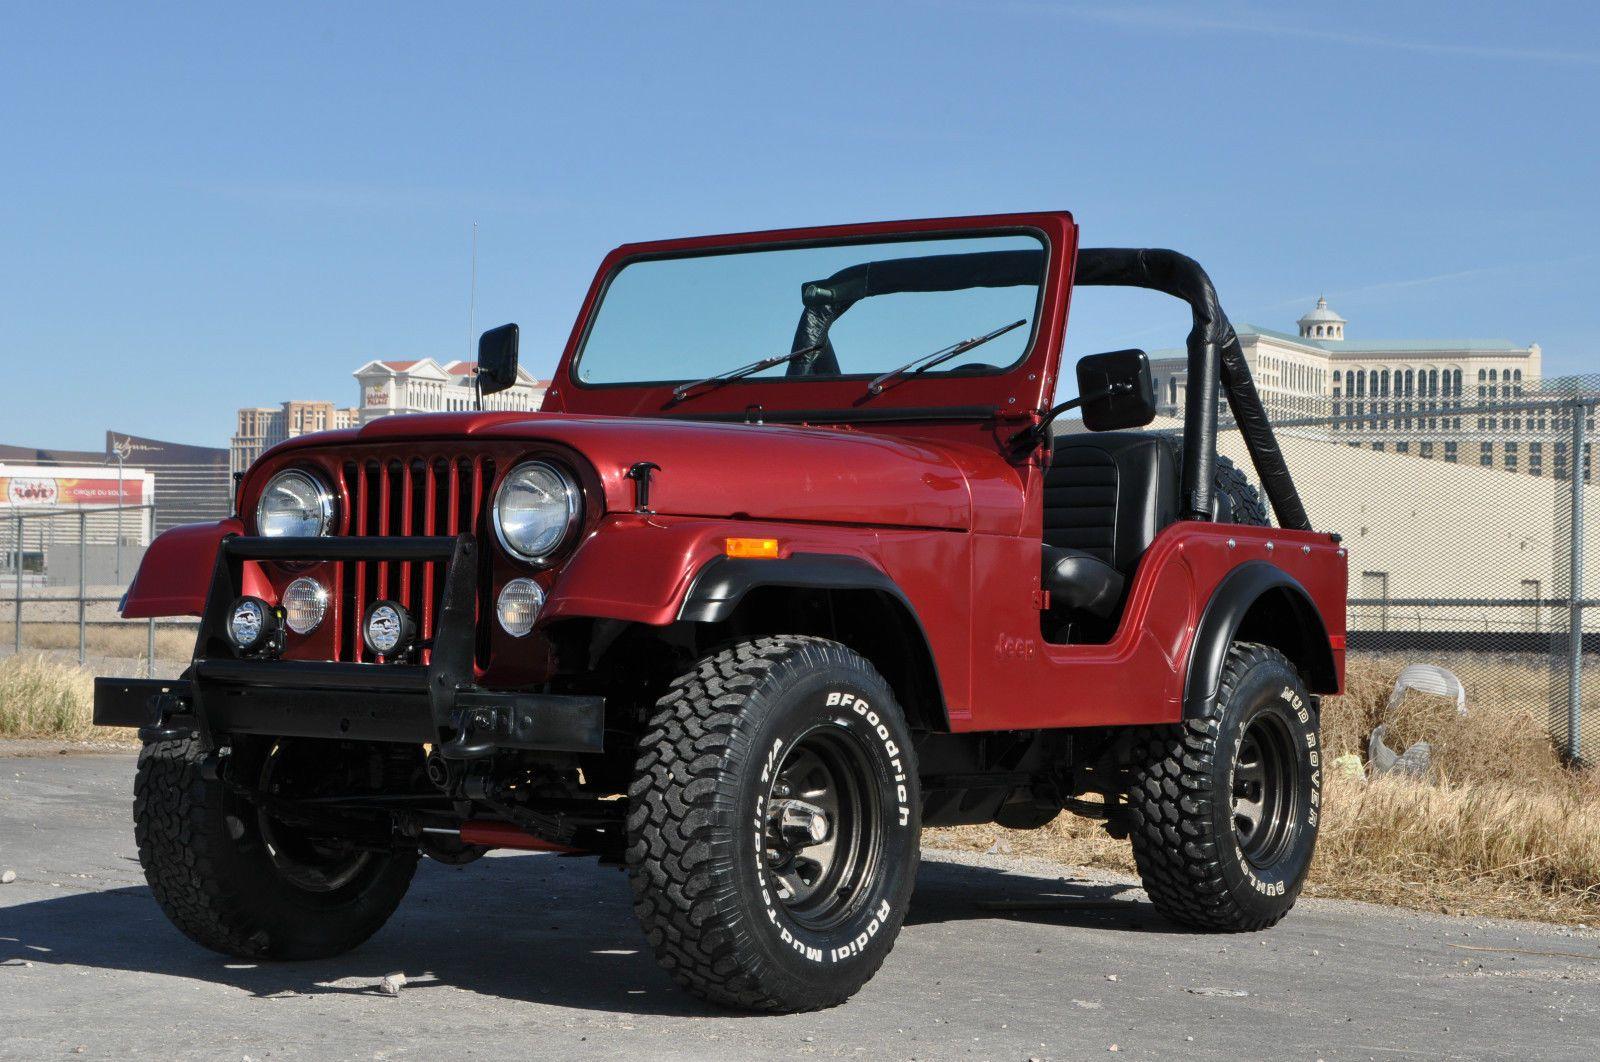 1978 Jeep Cj5 Jeep Cj Jeep Cj5 Jeep